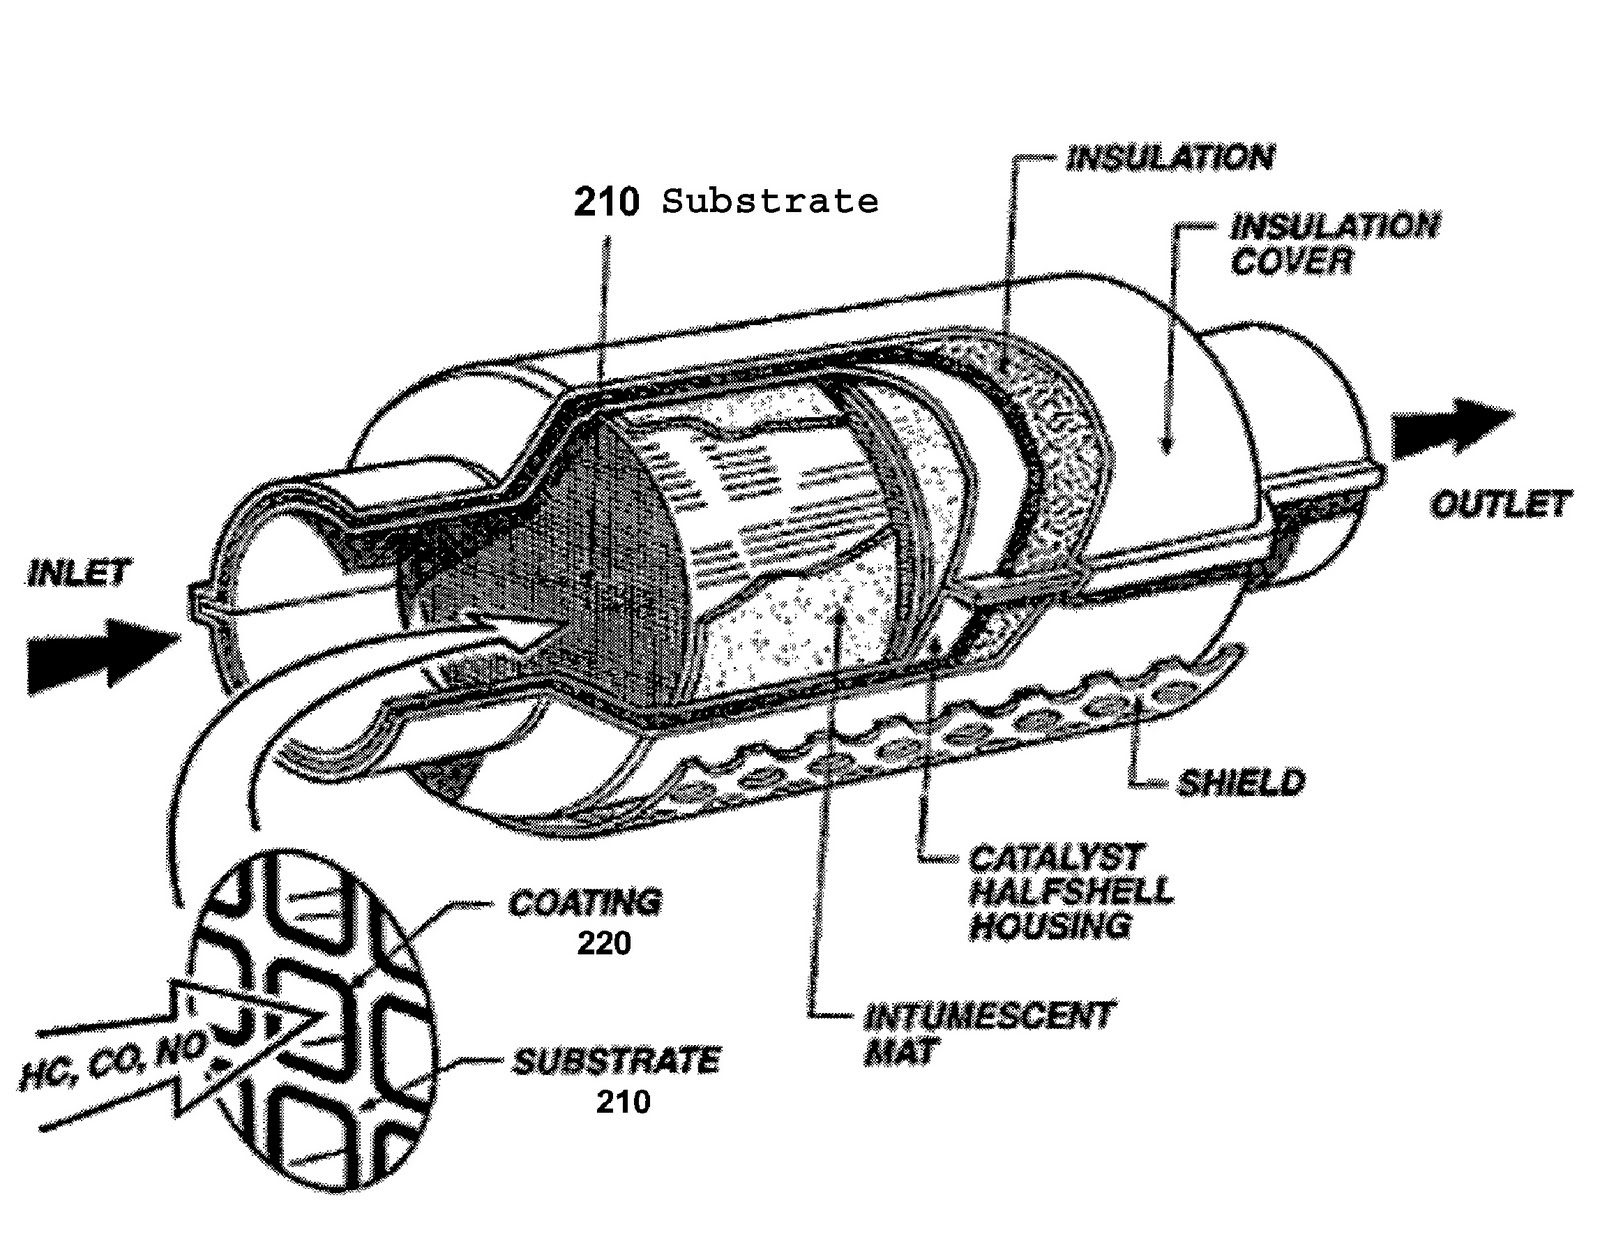 katalysator-uitleg.jpg